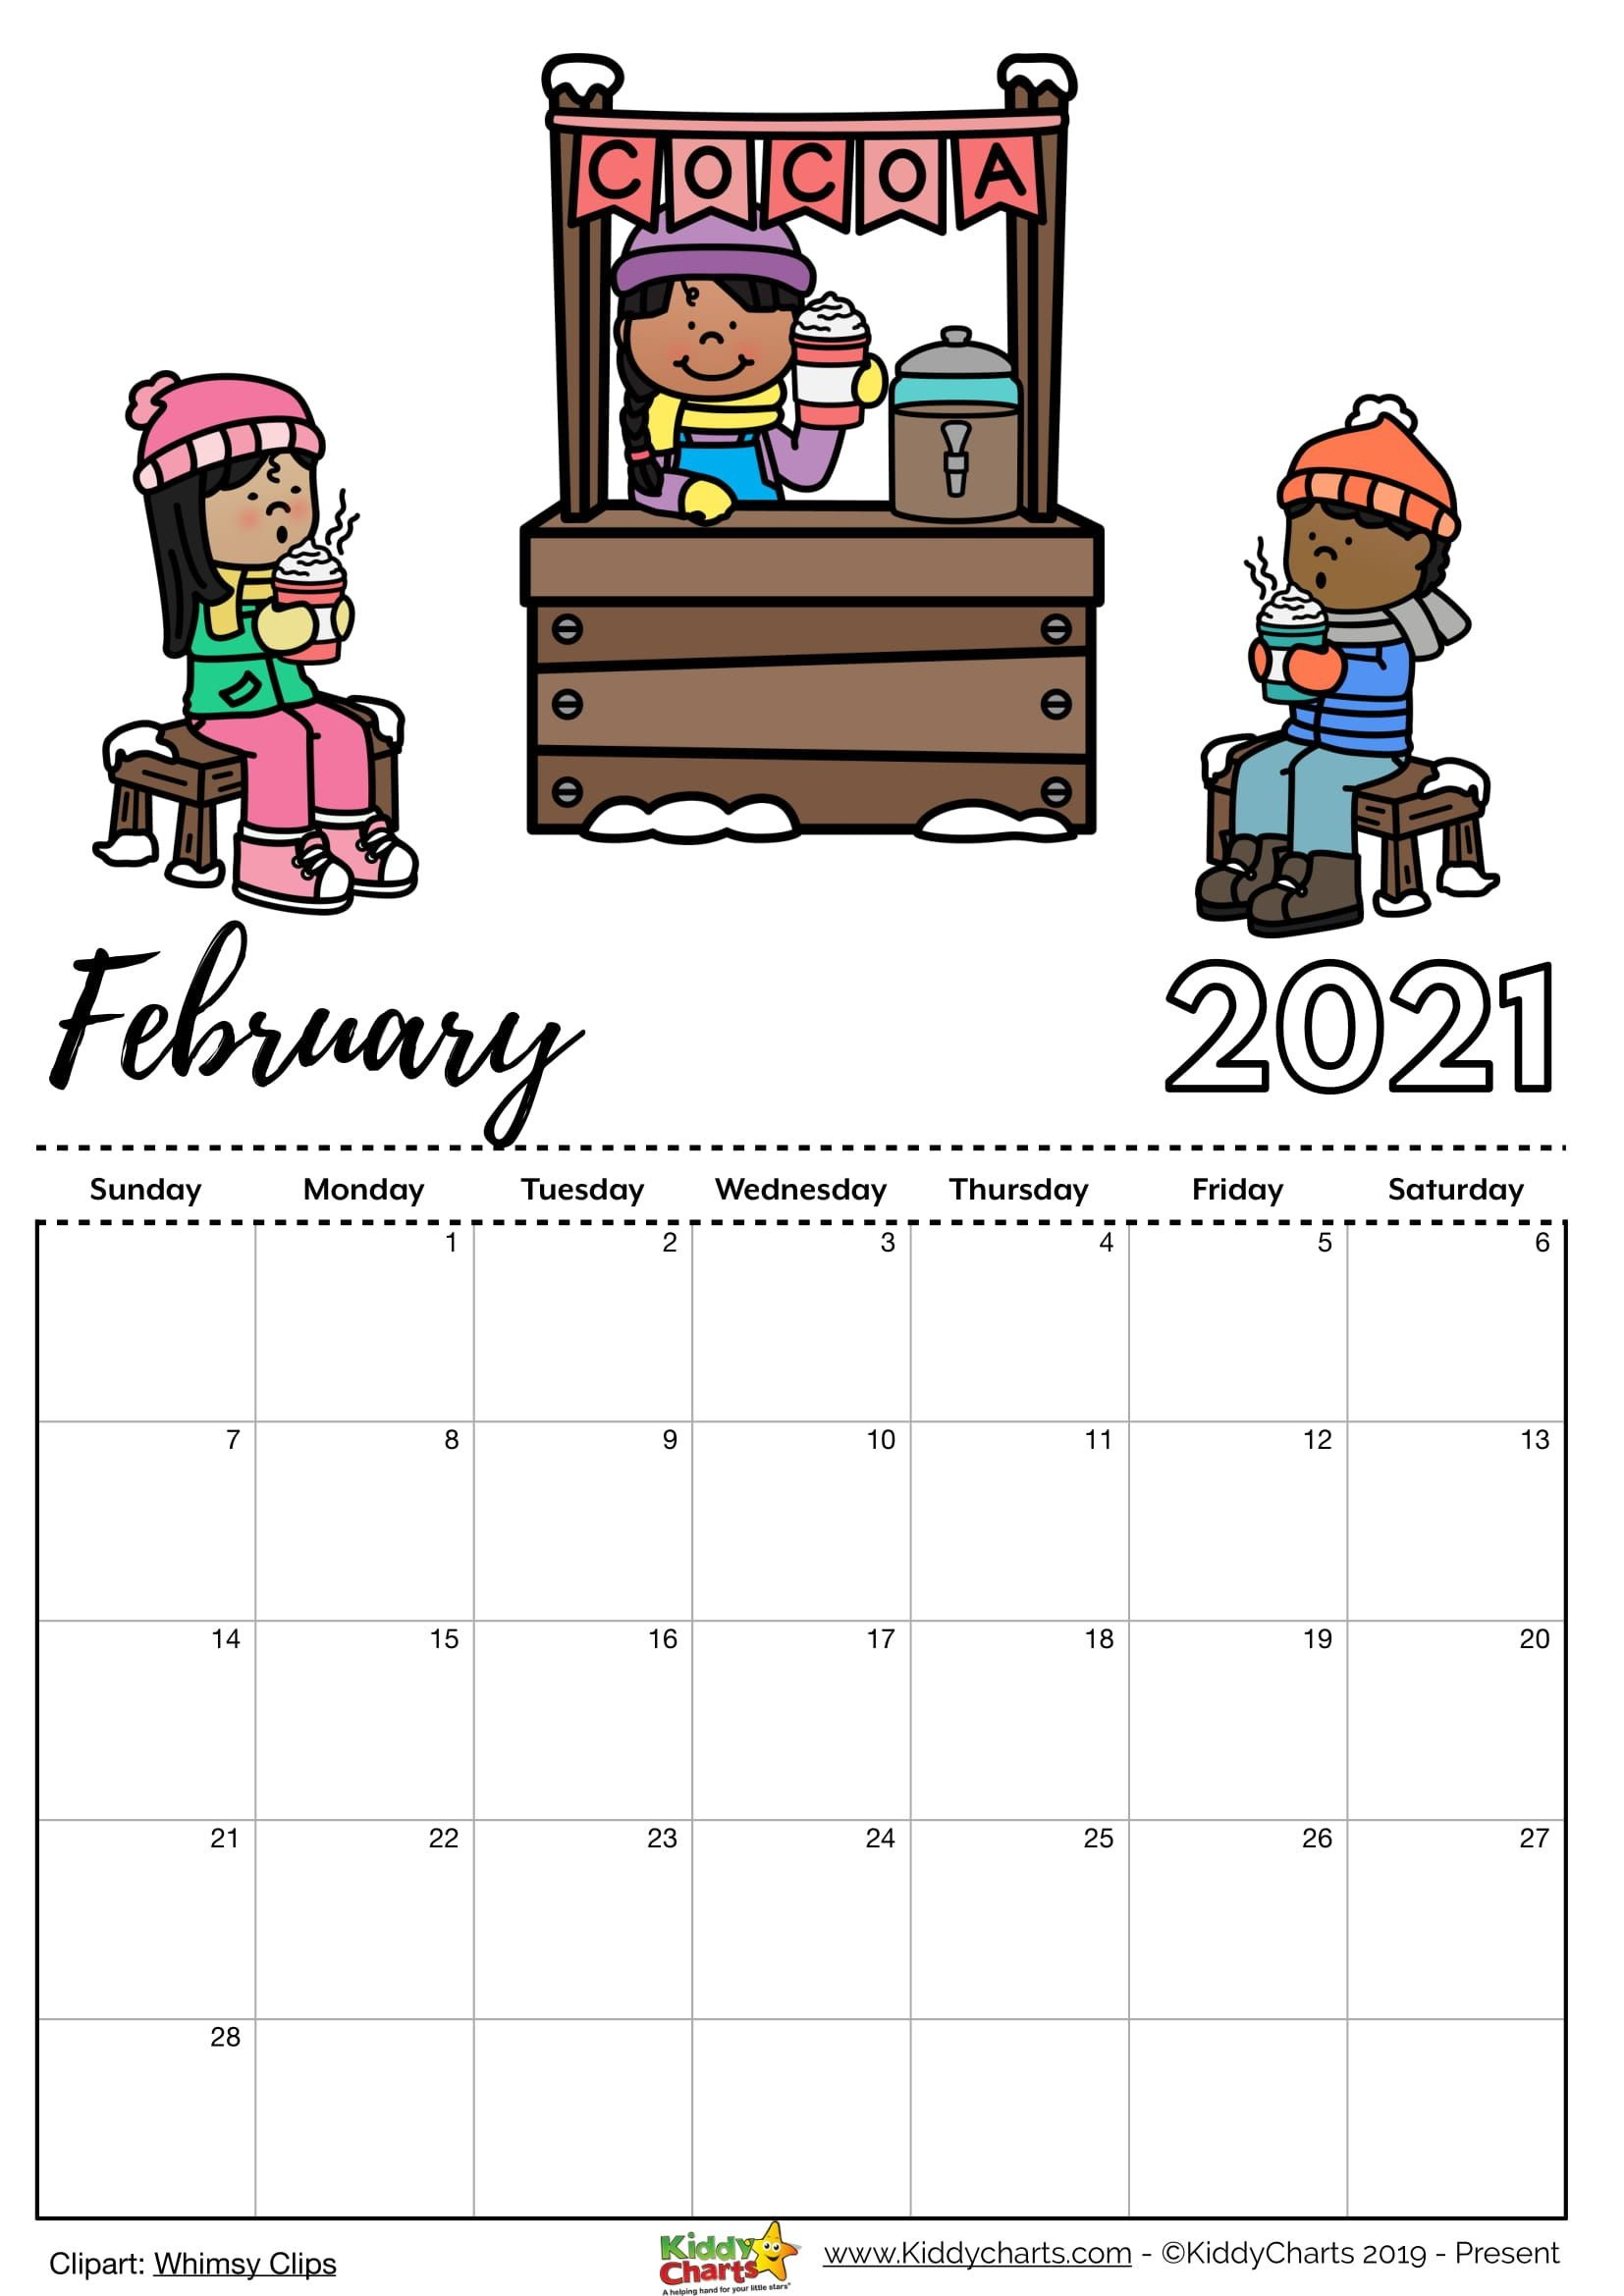 Check our new free printable 2021 calendar